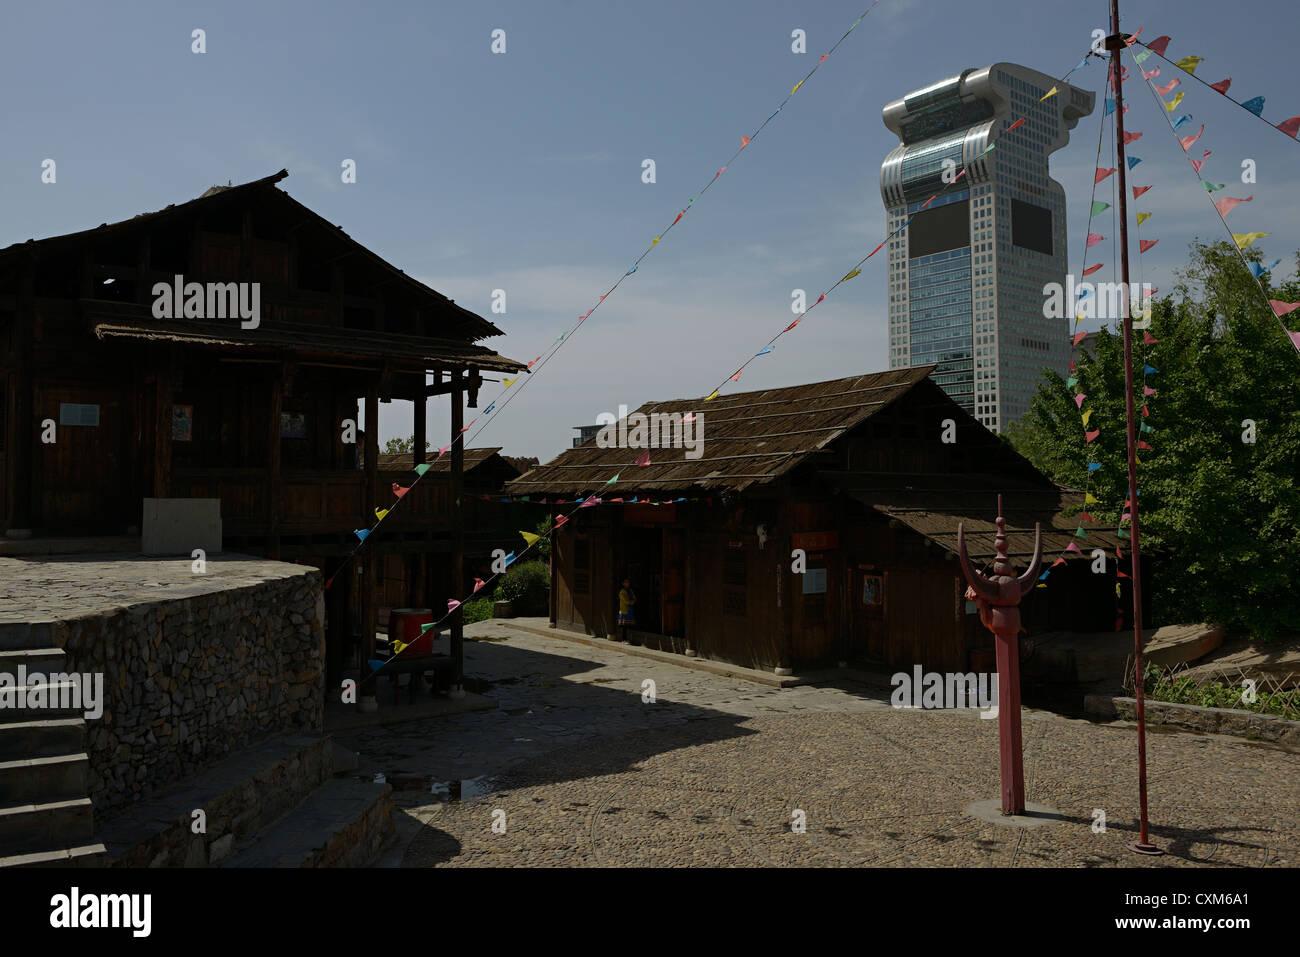 Edificio ibm desde Beijing minorías ethinic park china Imagen De Stock